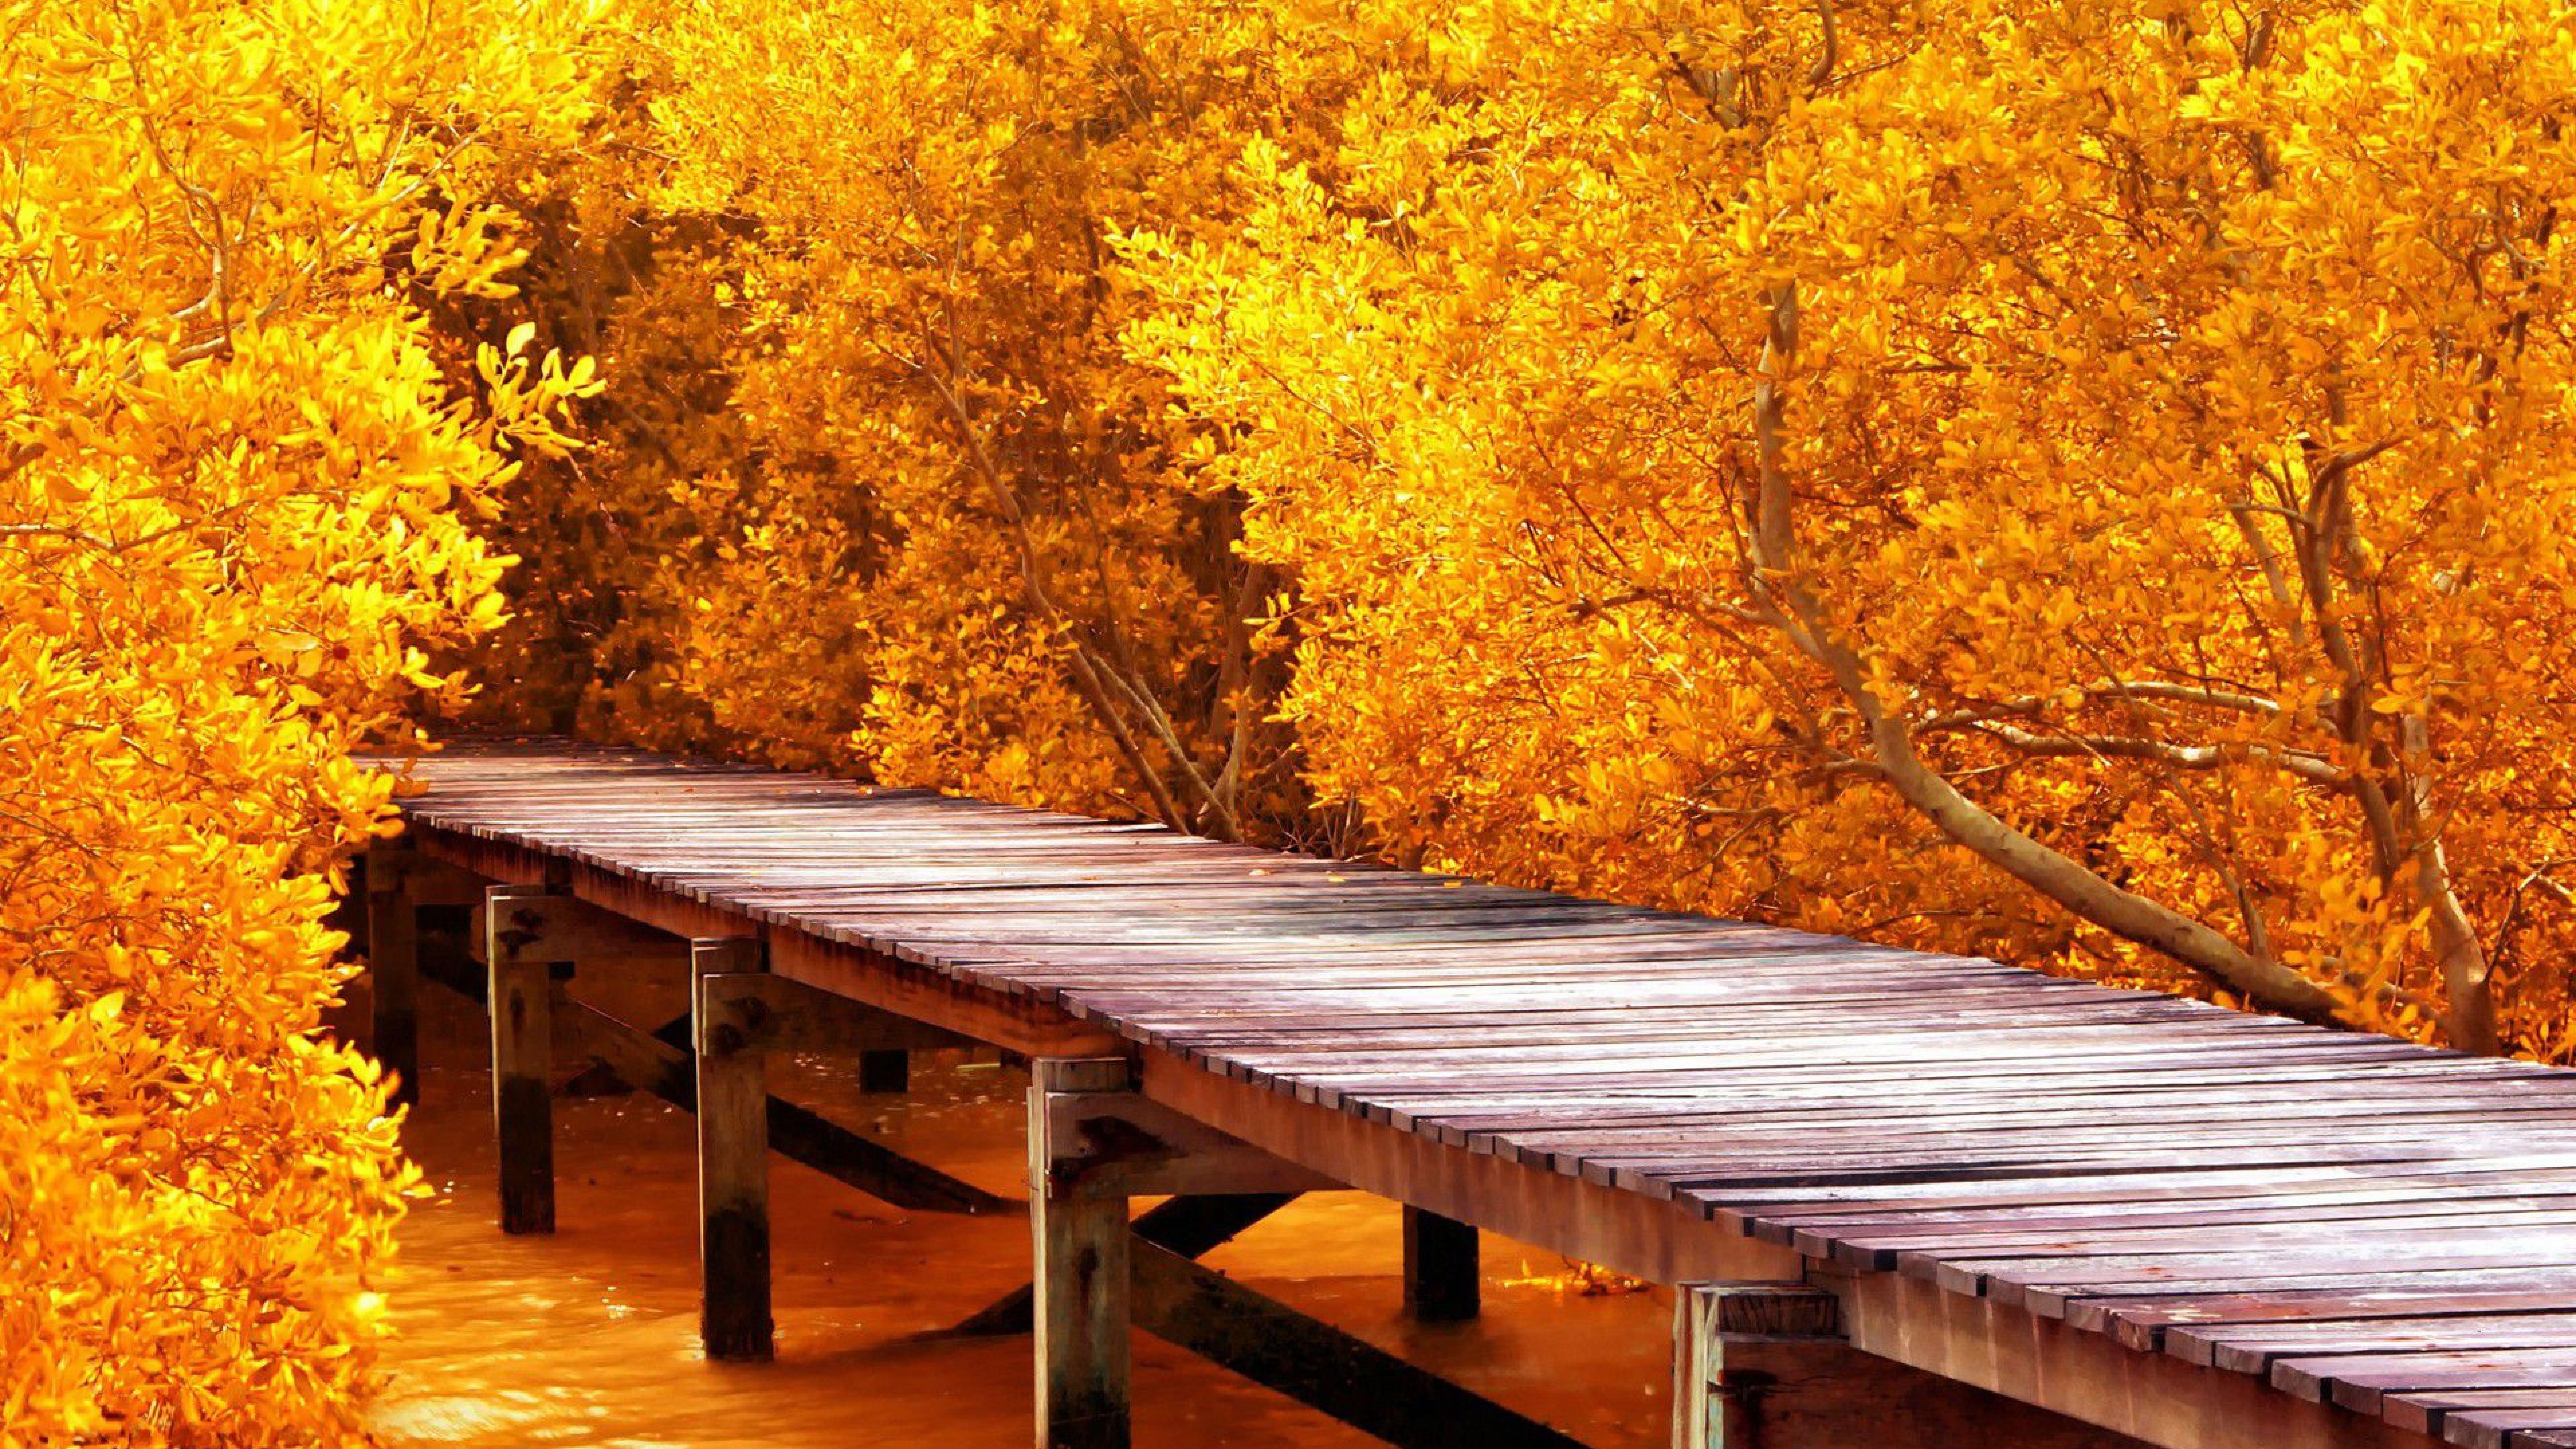 4k Ultra Hd Nature Wallpapers On Wallpaperdog